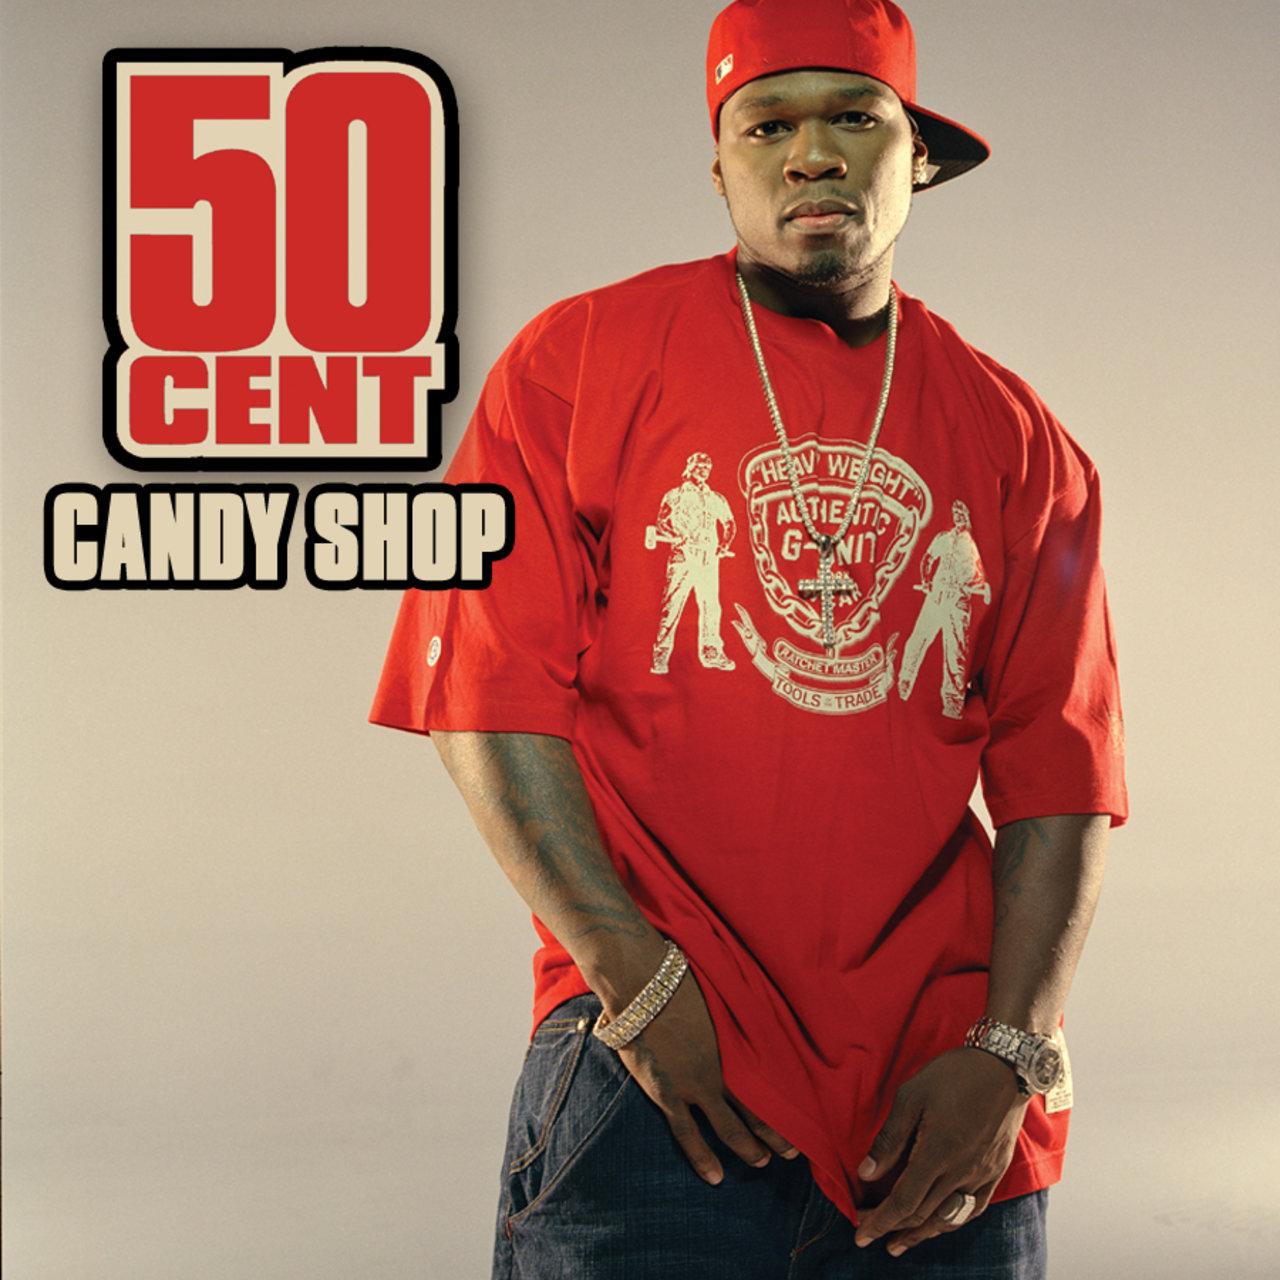 50 cent candy shop ft olivia скачать 320.